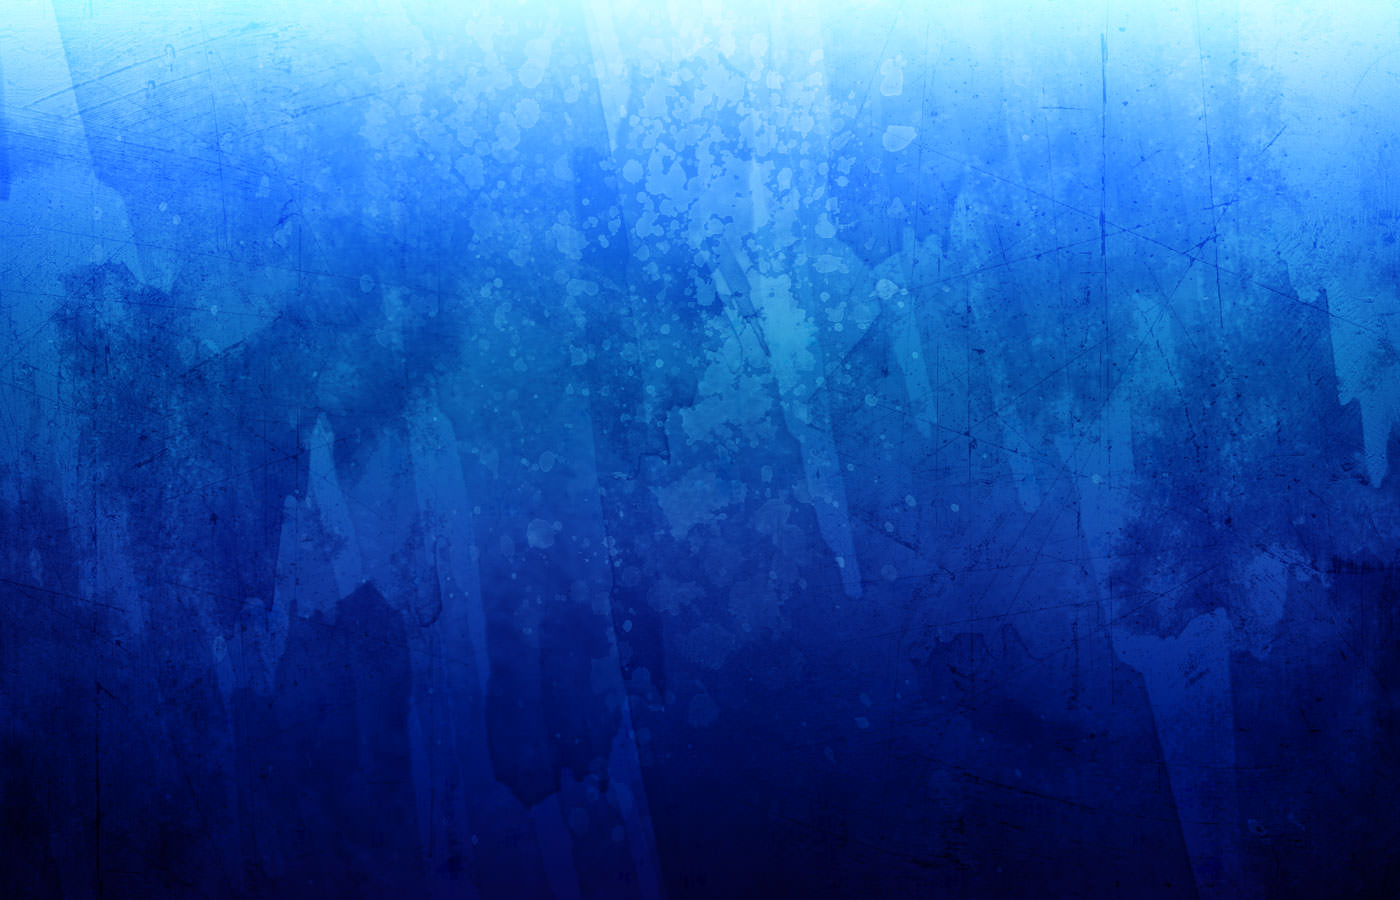 Waterlor Dark Blue Grunge Art PPT Backgrounds